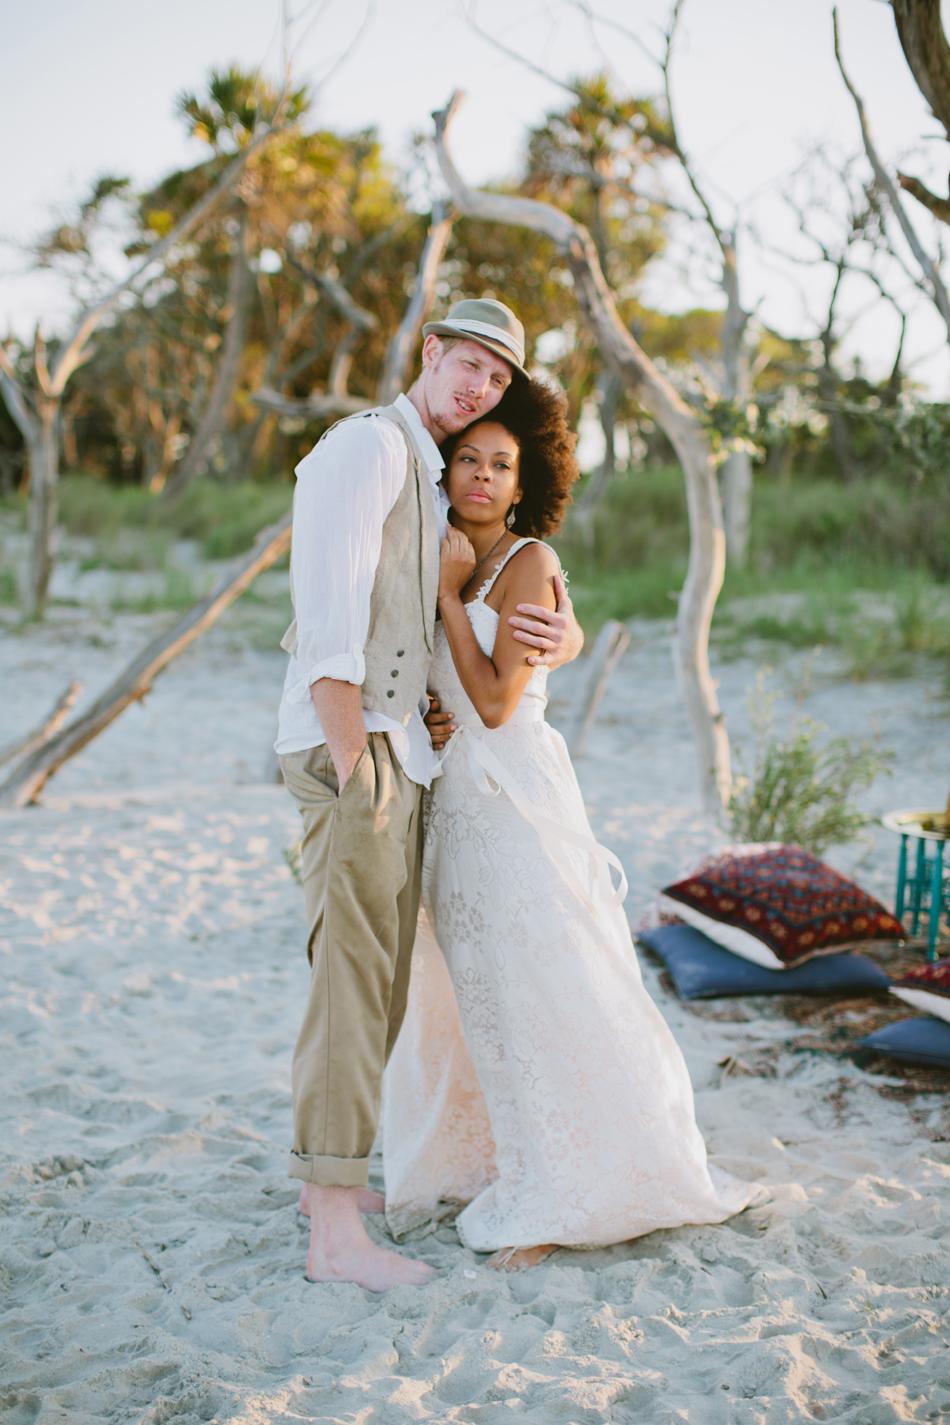 Jameykay_arlie_bohemian_elopement_styled_shoot062.jpg